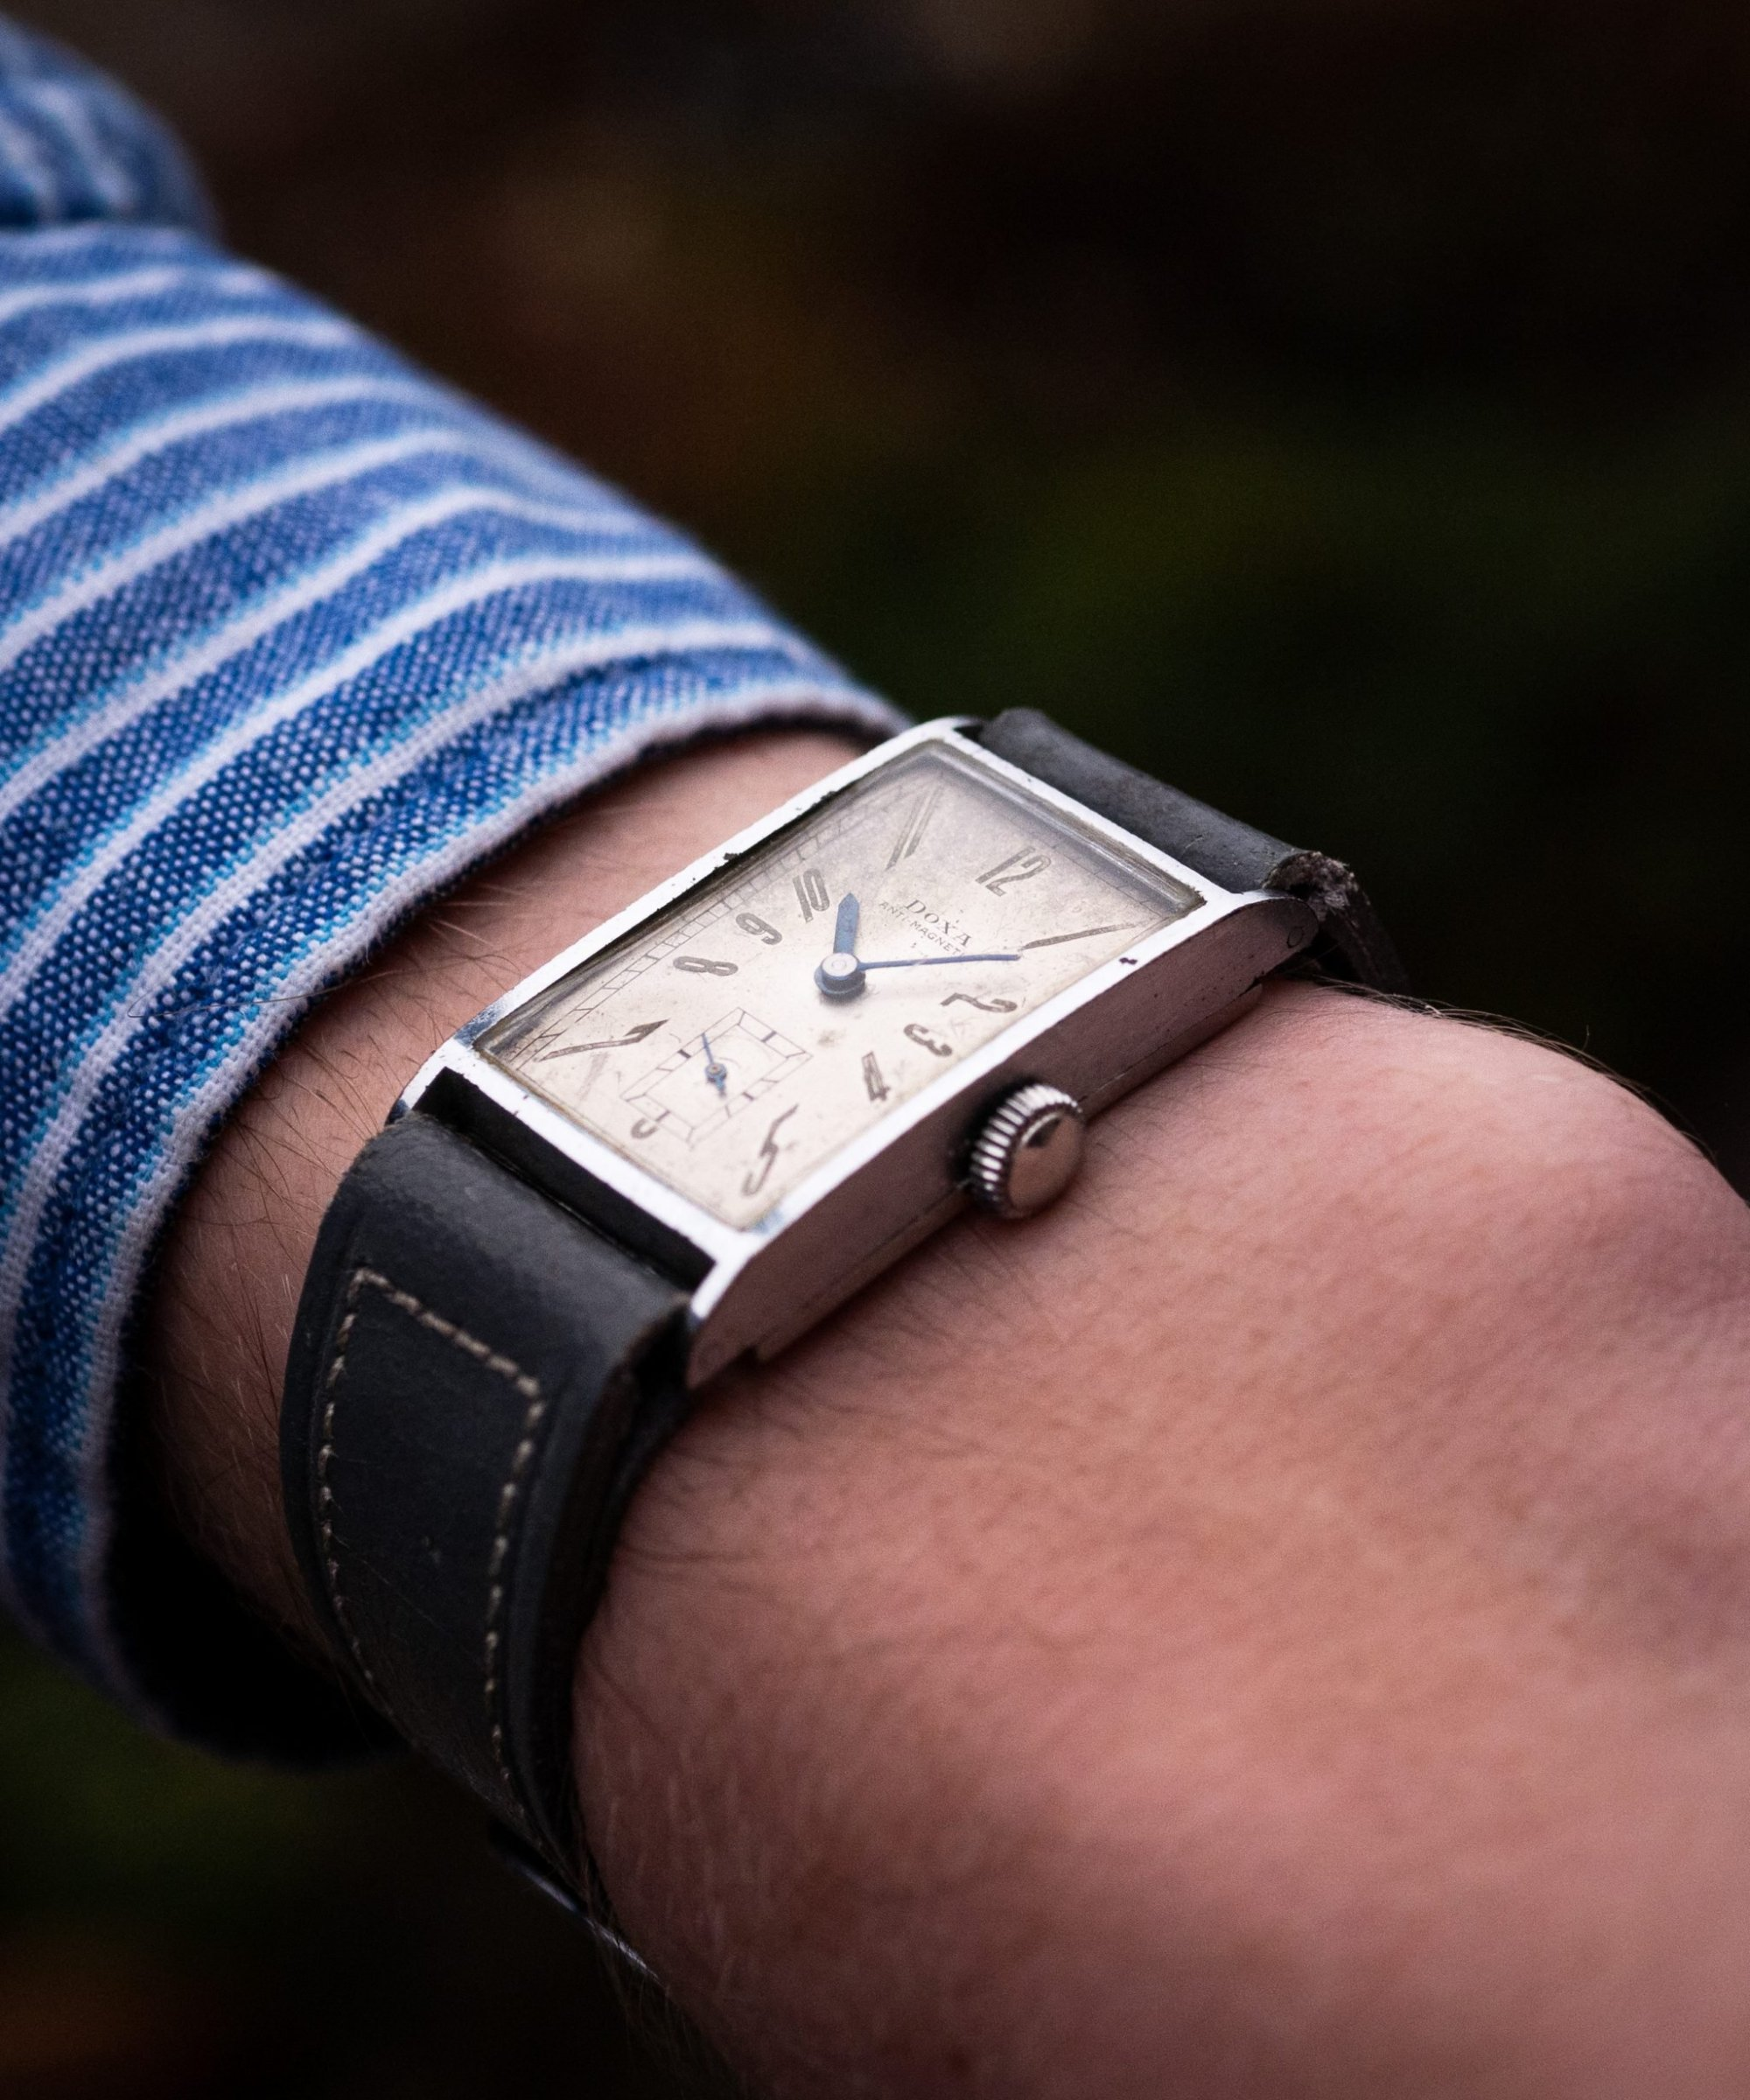 Vintage Doxa tank watch radium antimagnetique vintage watch